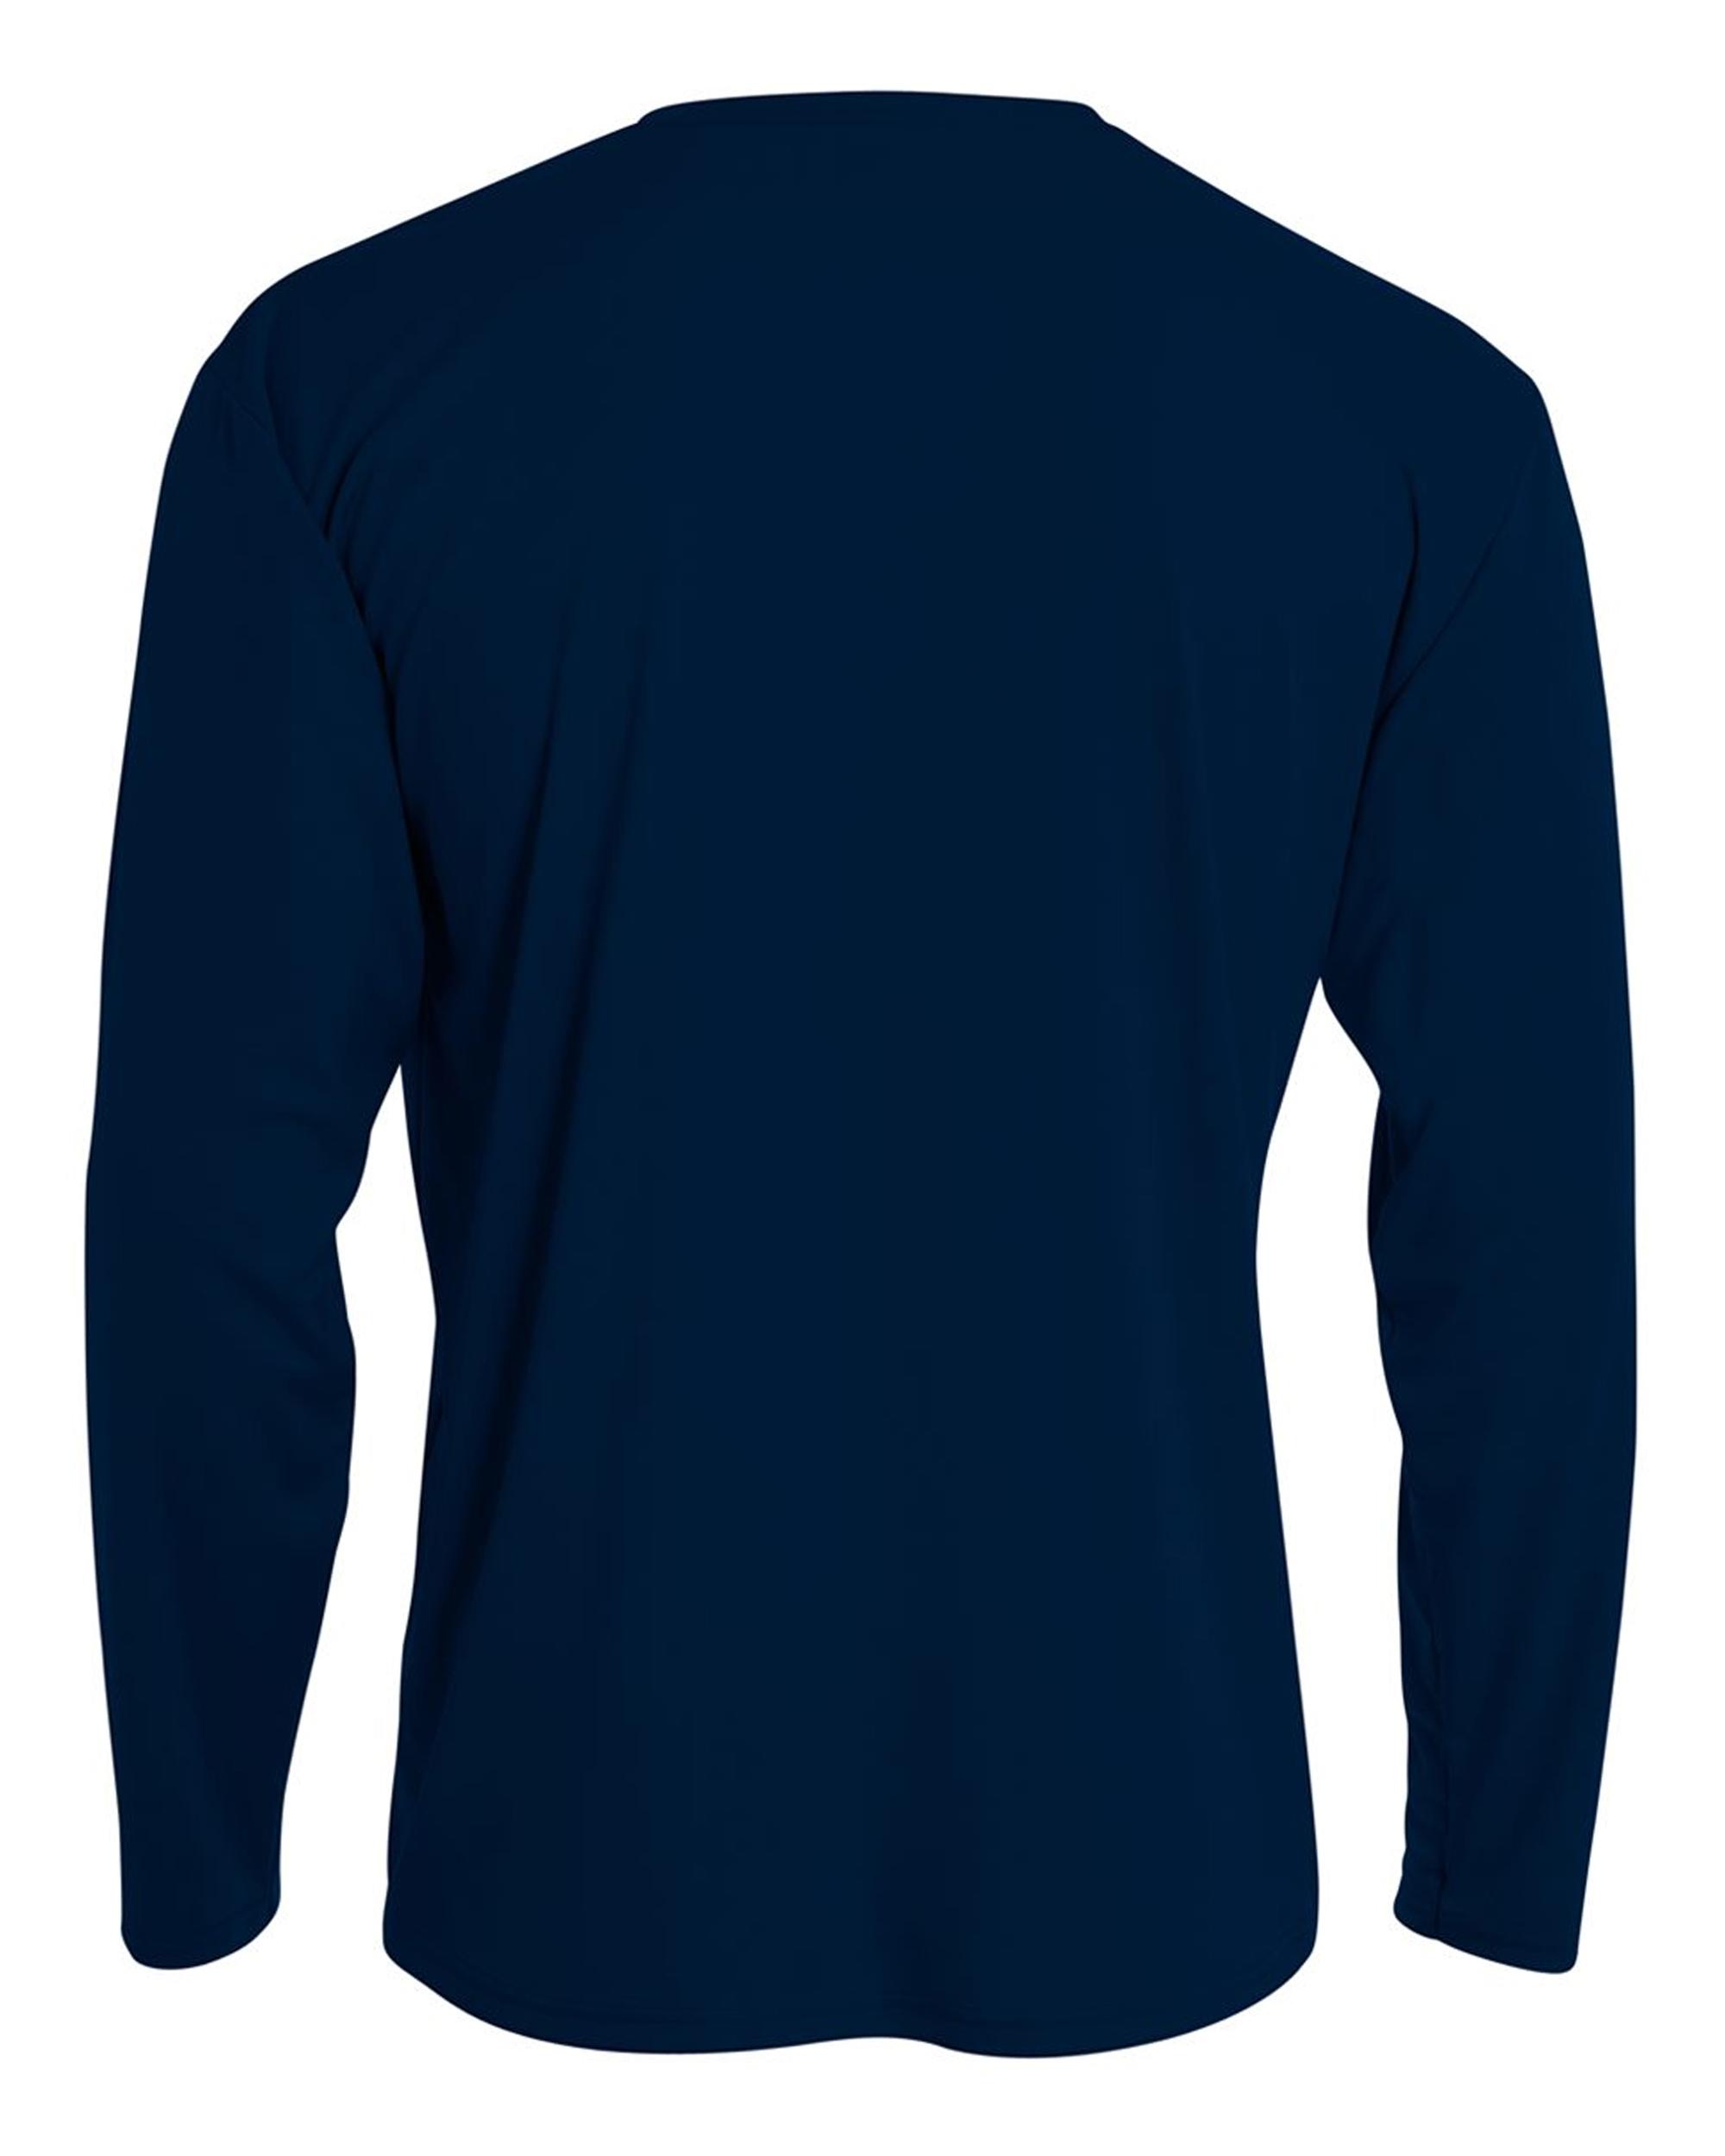 Men-039-s-Long-Sleeve-Loose-Fit-Rash-Guard-Surf-Shirt-Water-Sports-Swimwear thumbnail 14